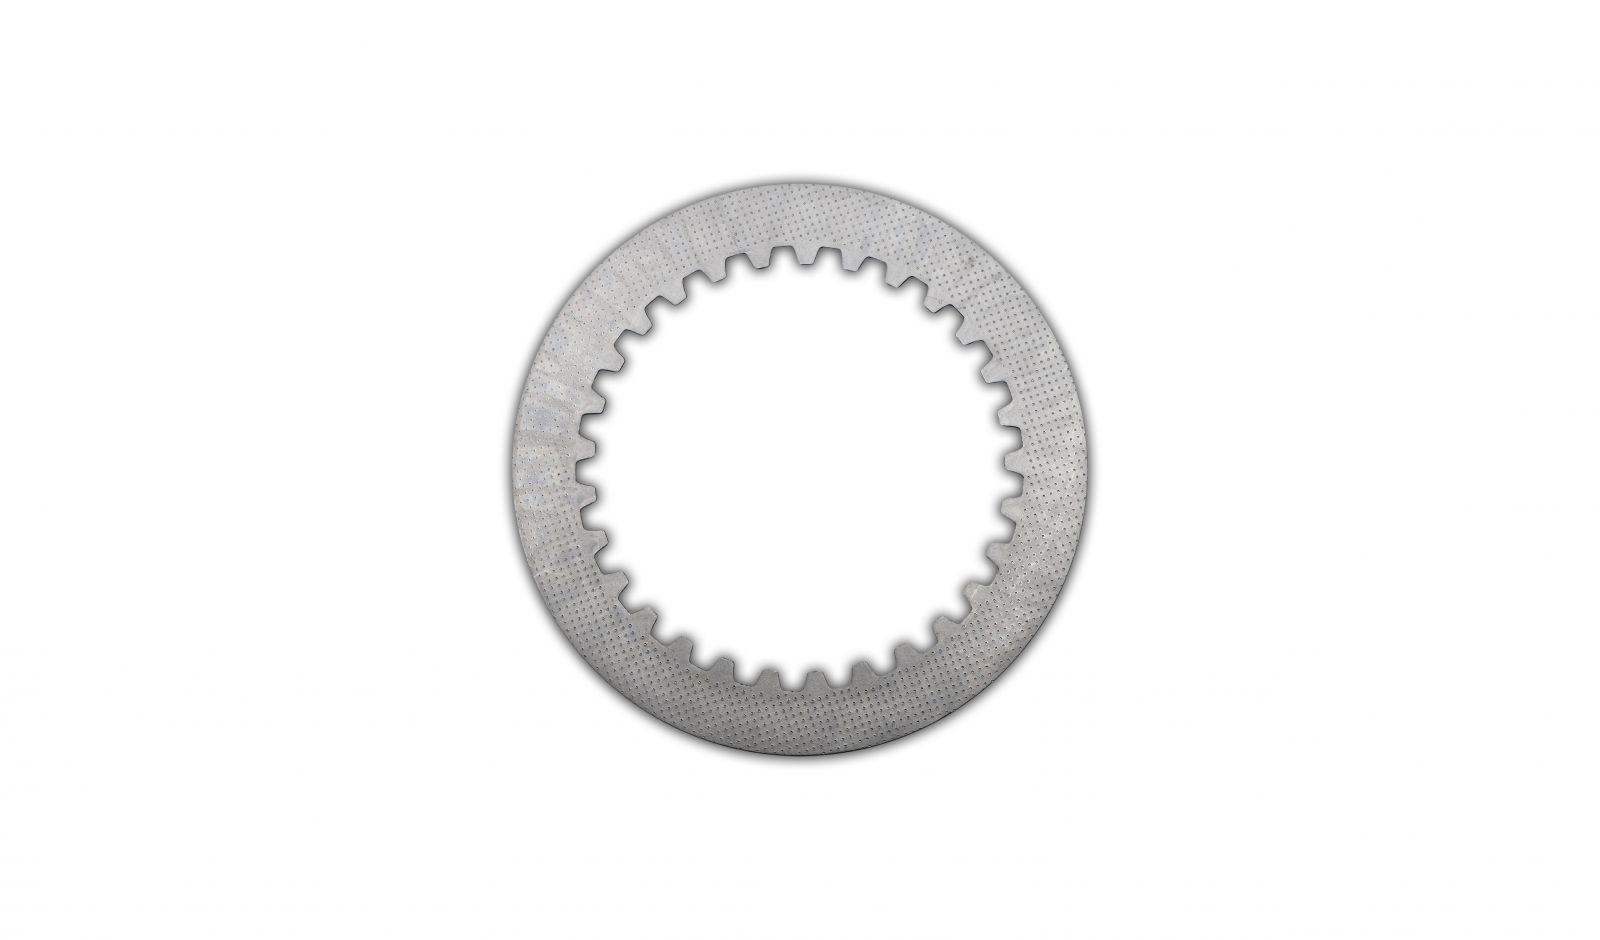 Clutch Metal Plates - 305233H image